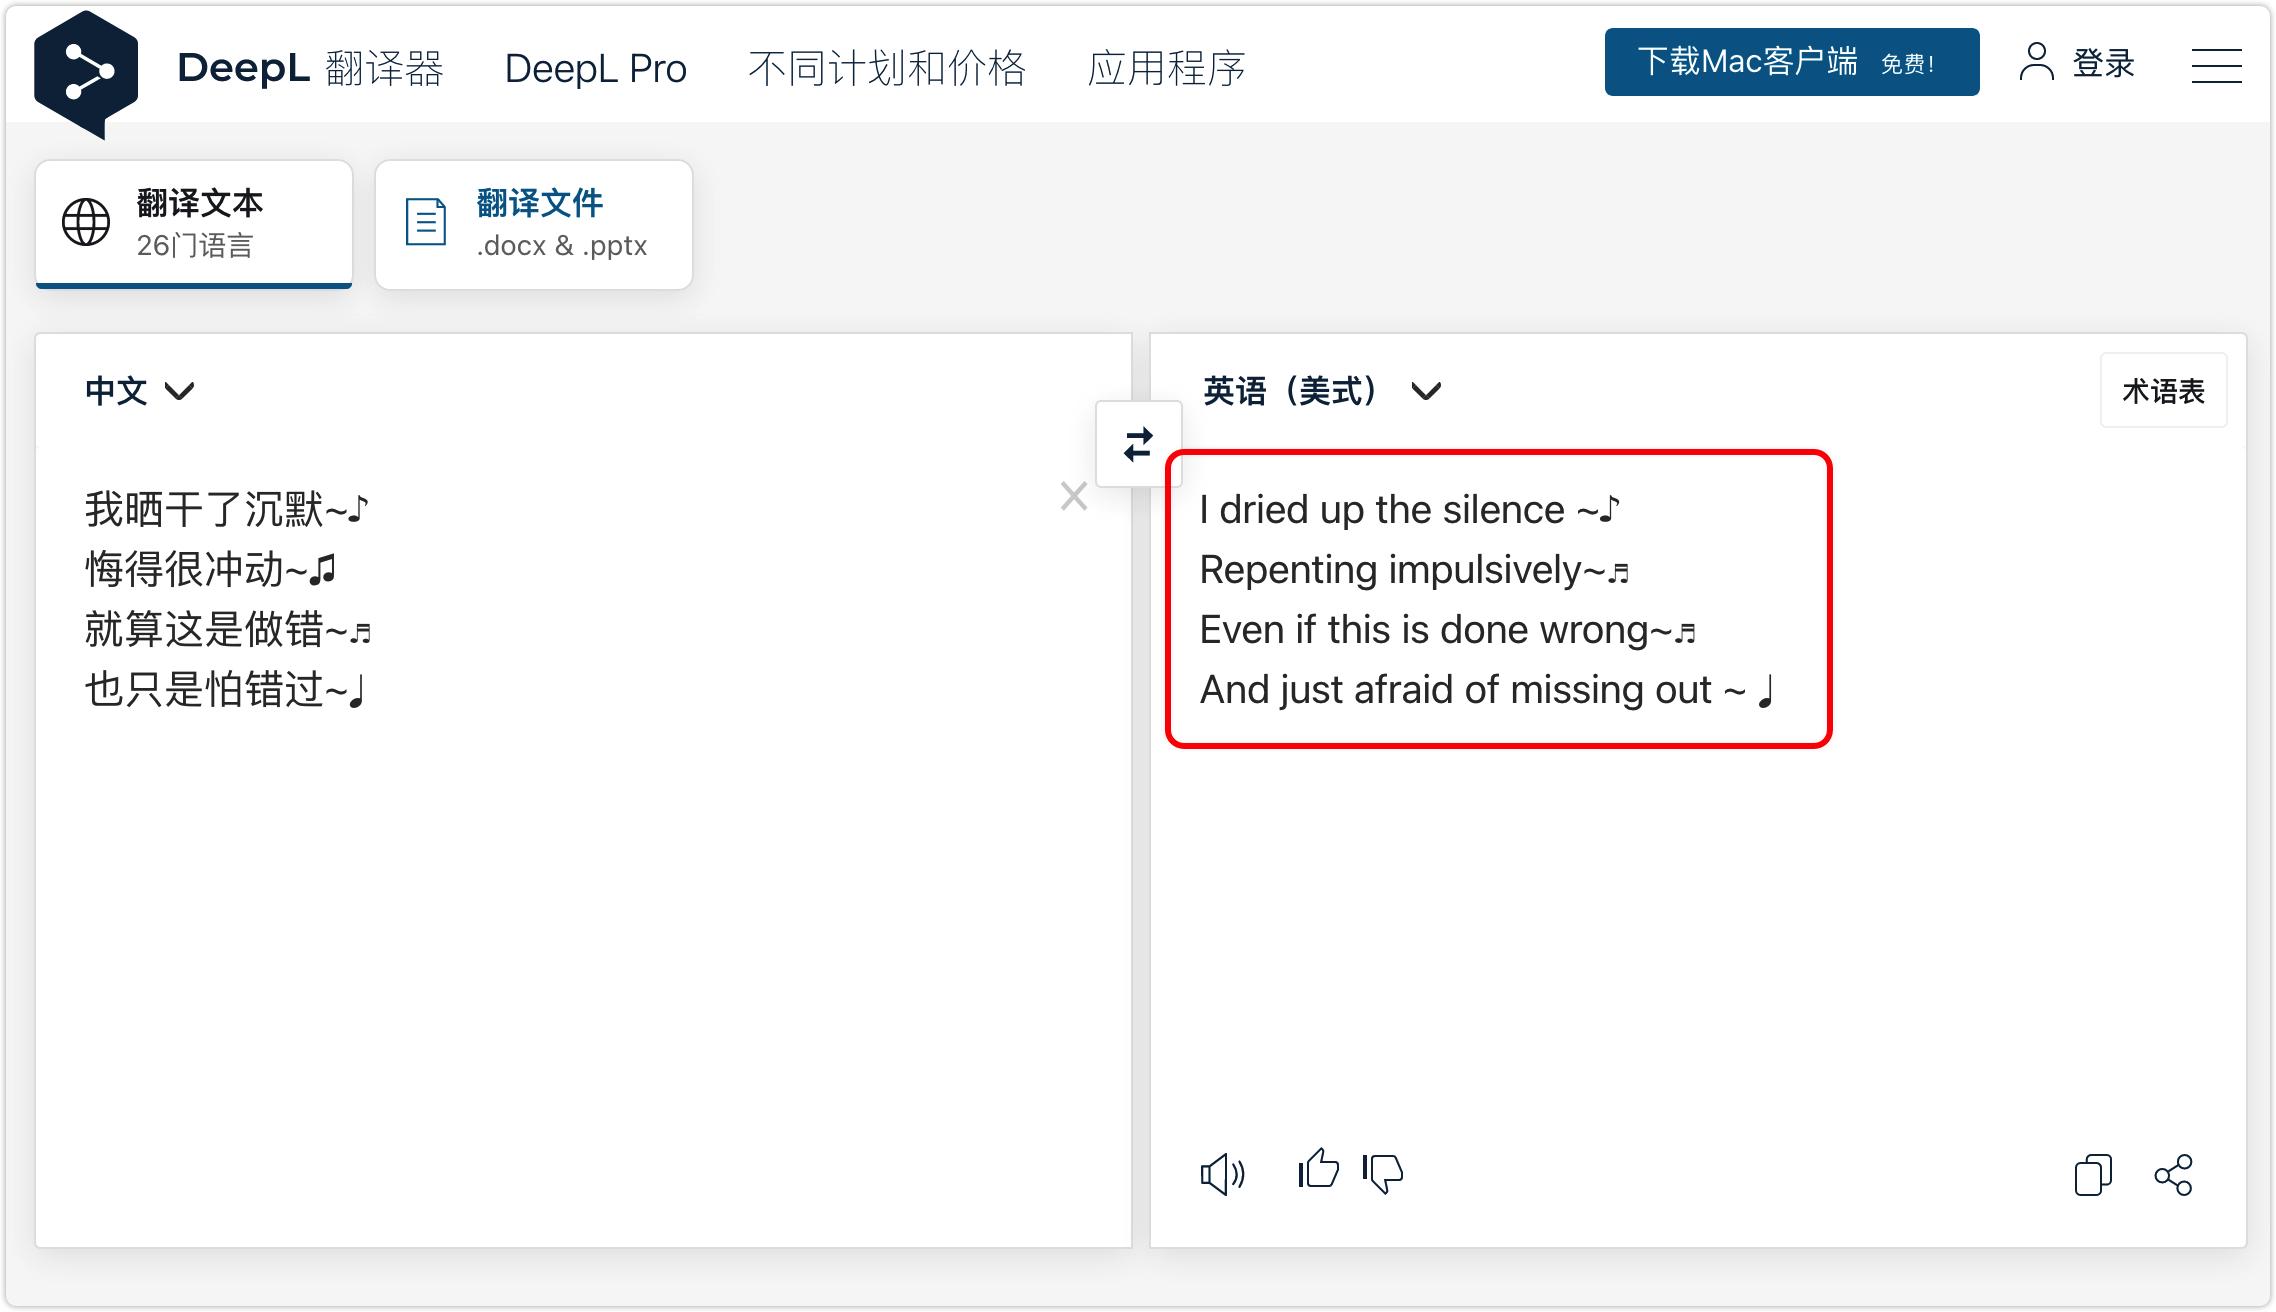 i11_翻译网站DeepL